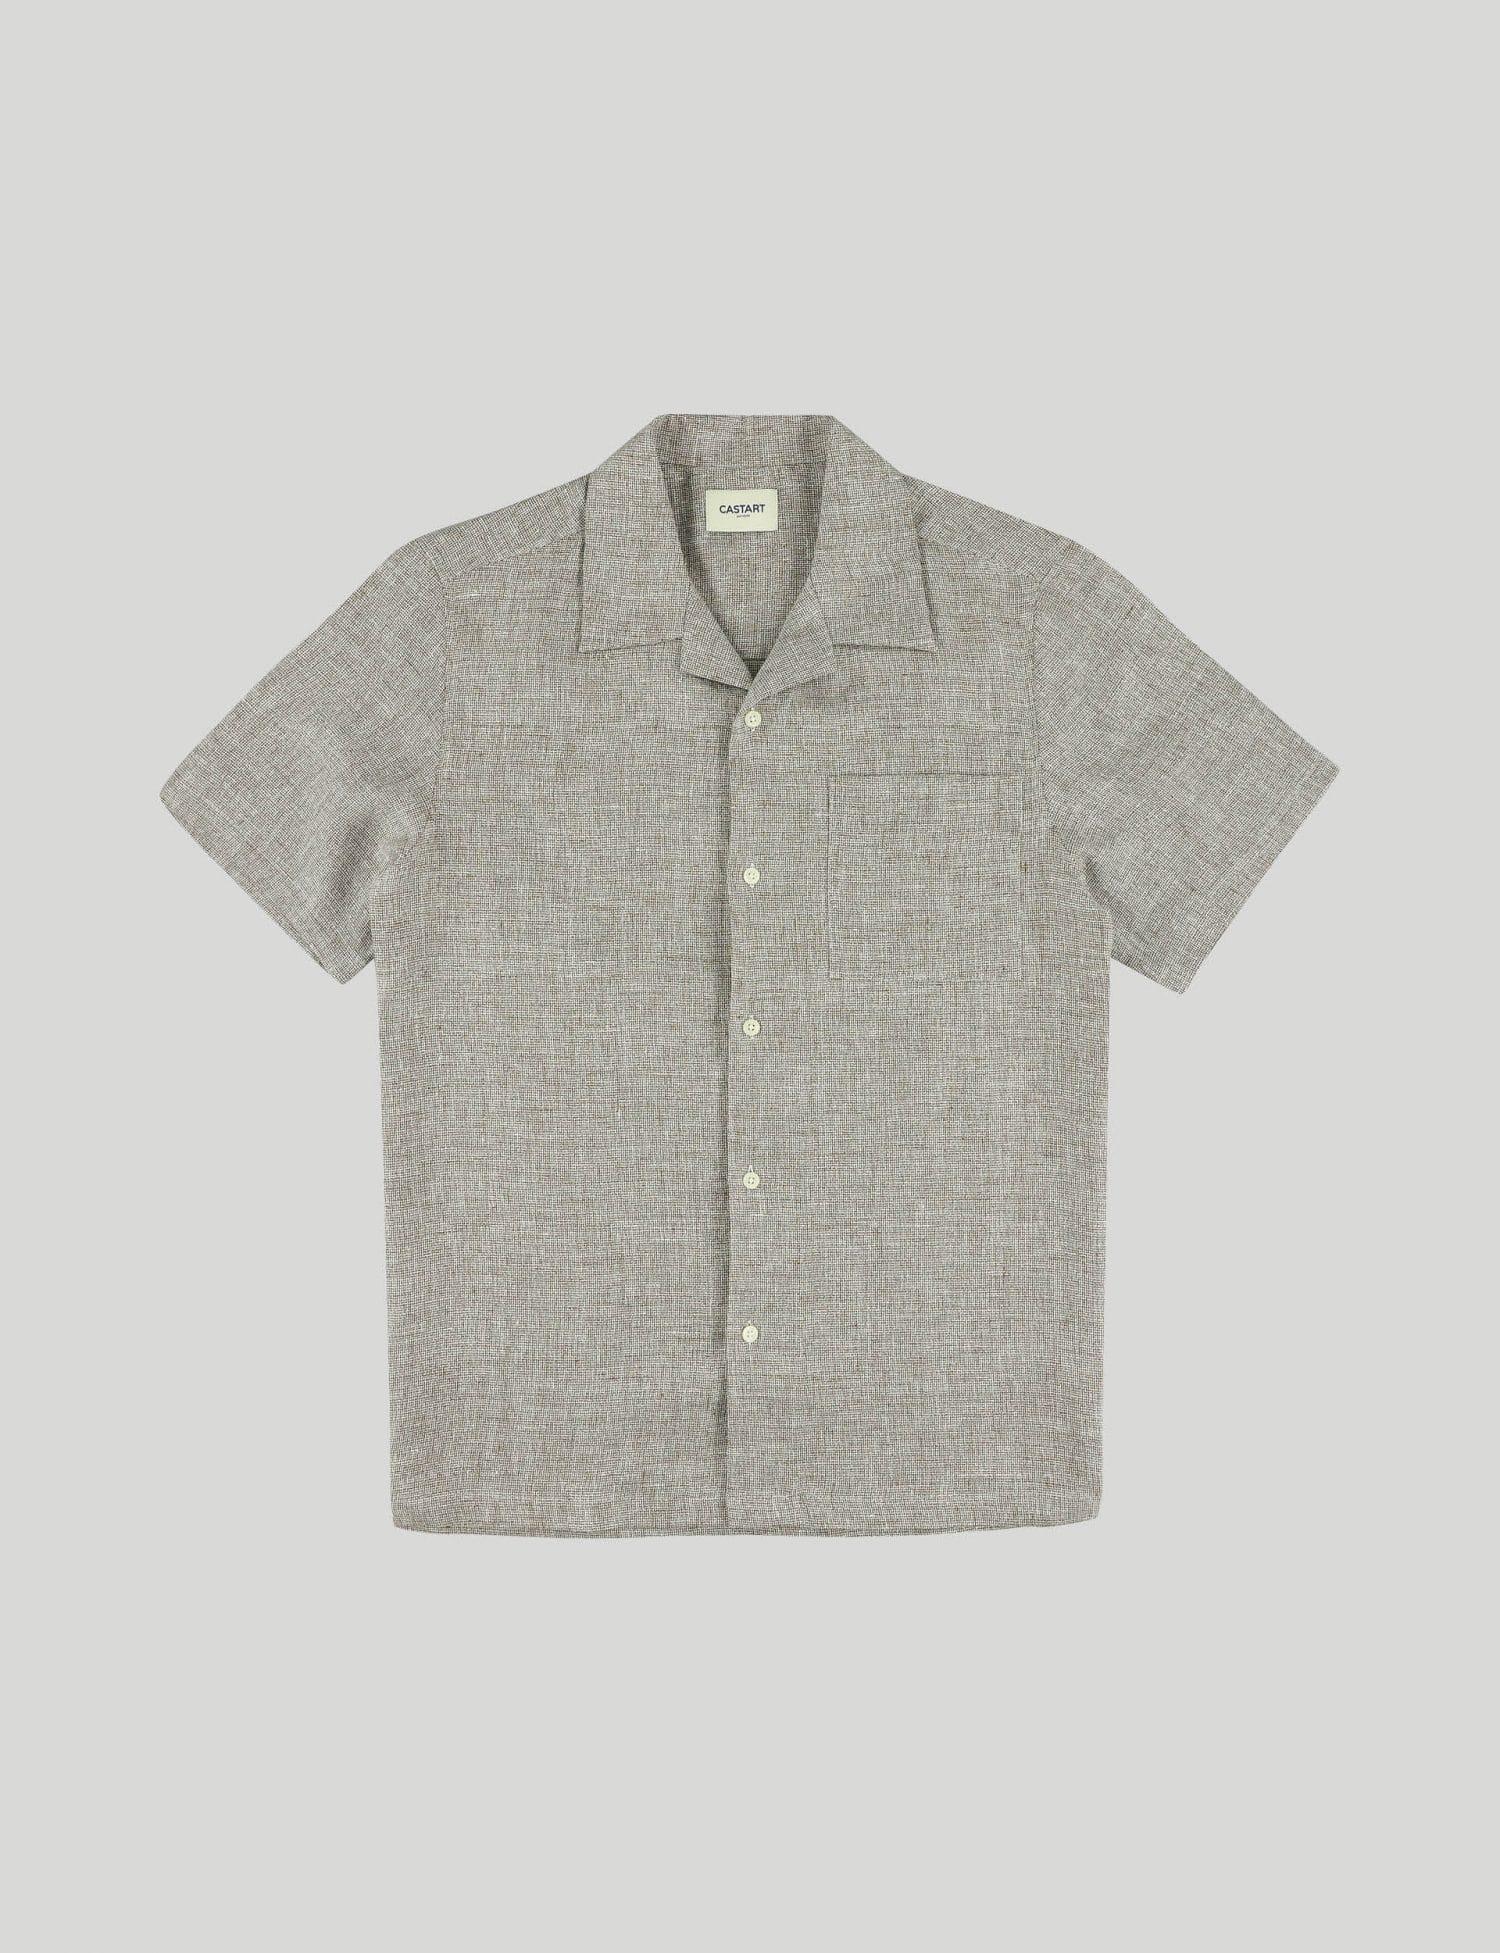 Castart - Devilshead SL Shirt - Brown